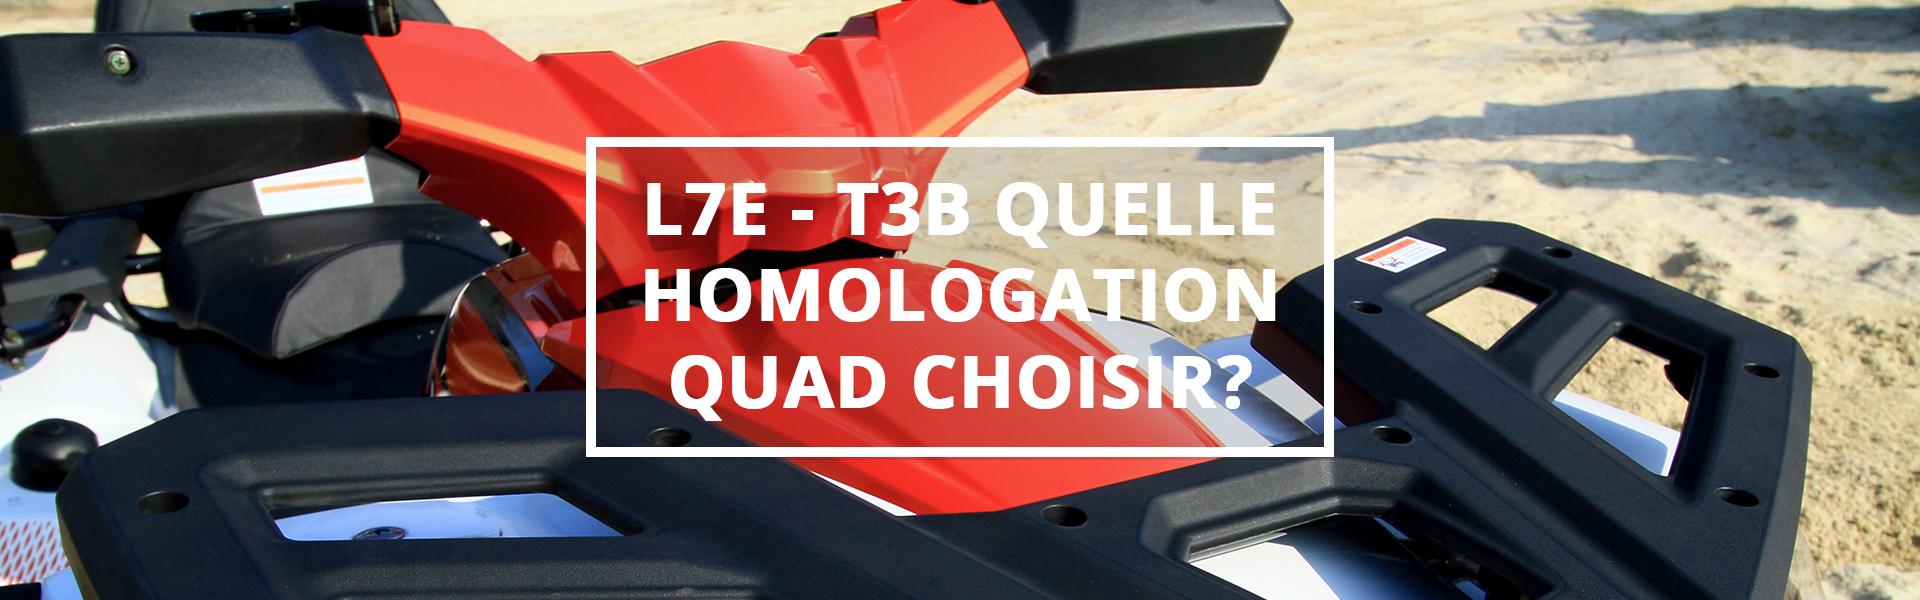 homologation-quad-choisir